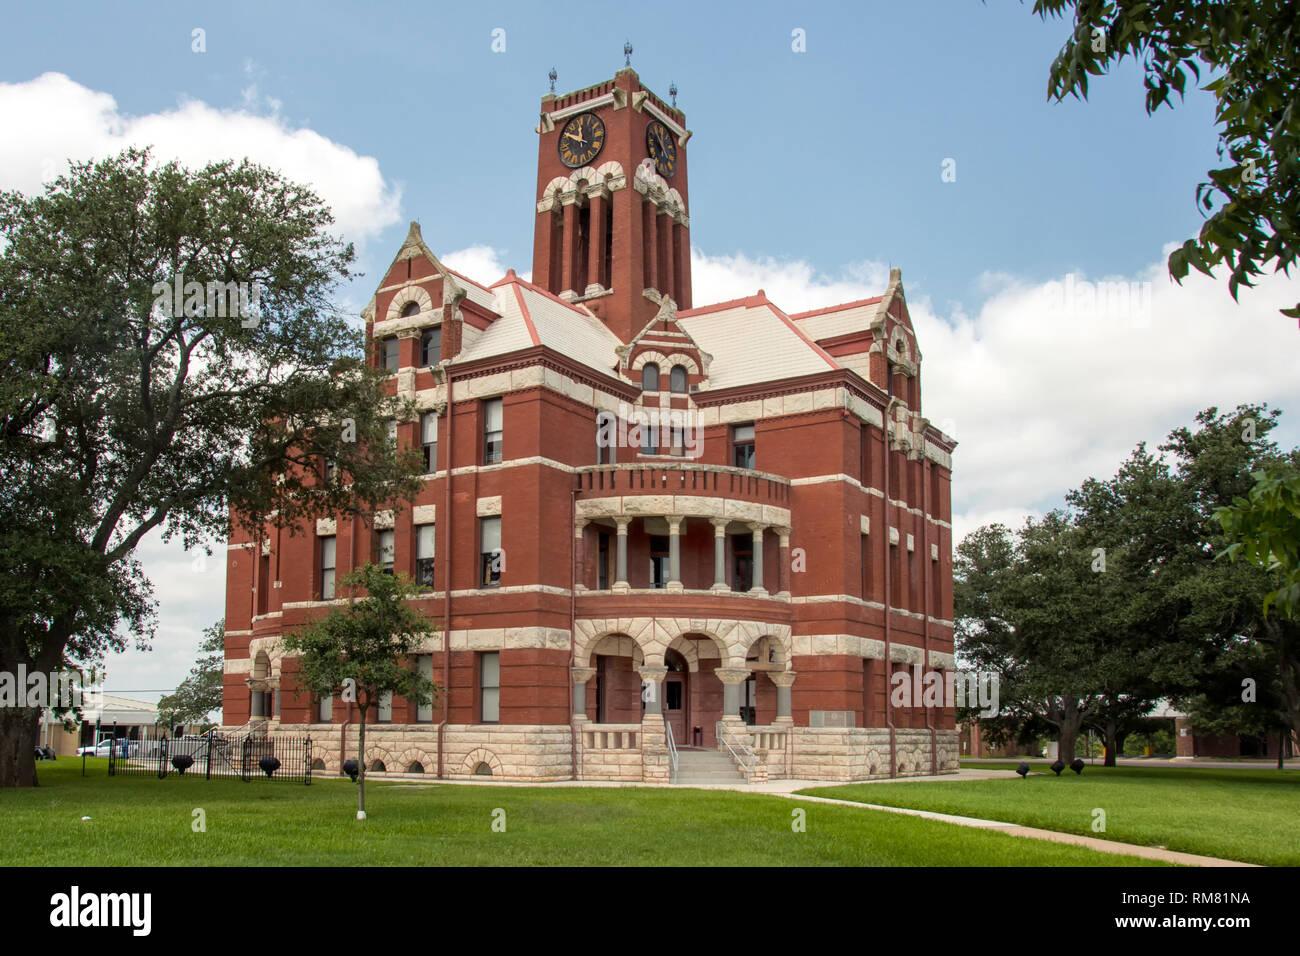 Lee County Courthouse - Giddings, Texas - Stock Image